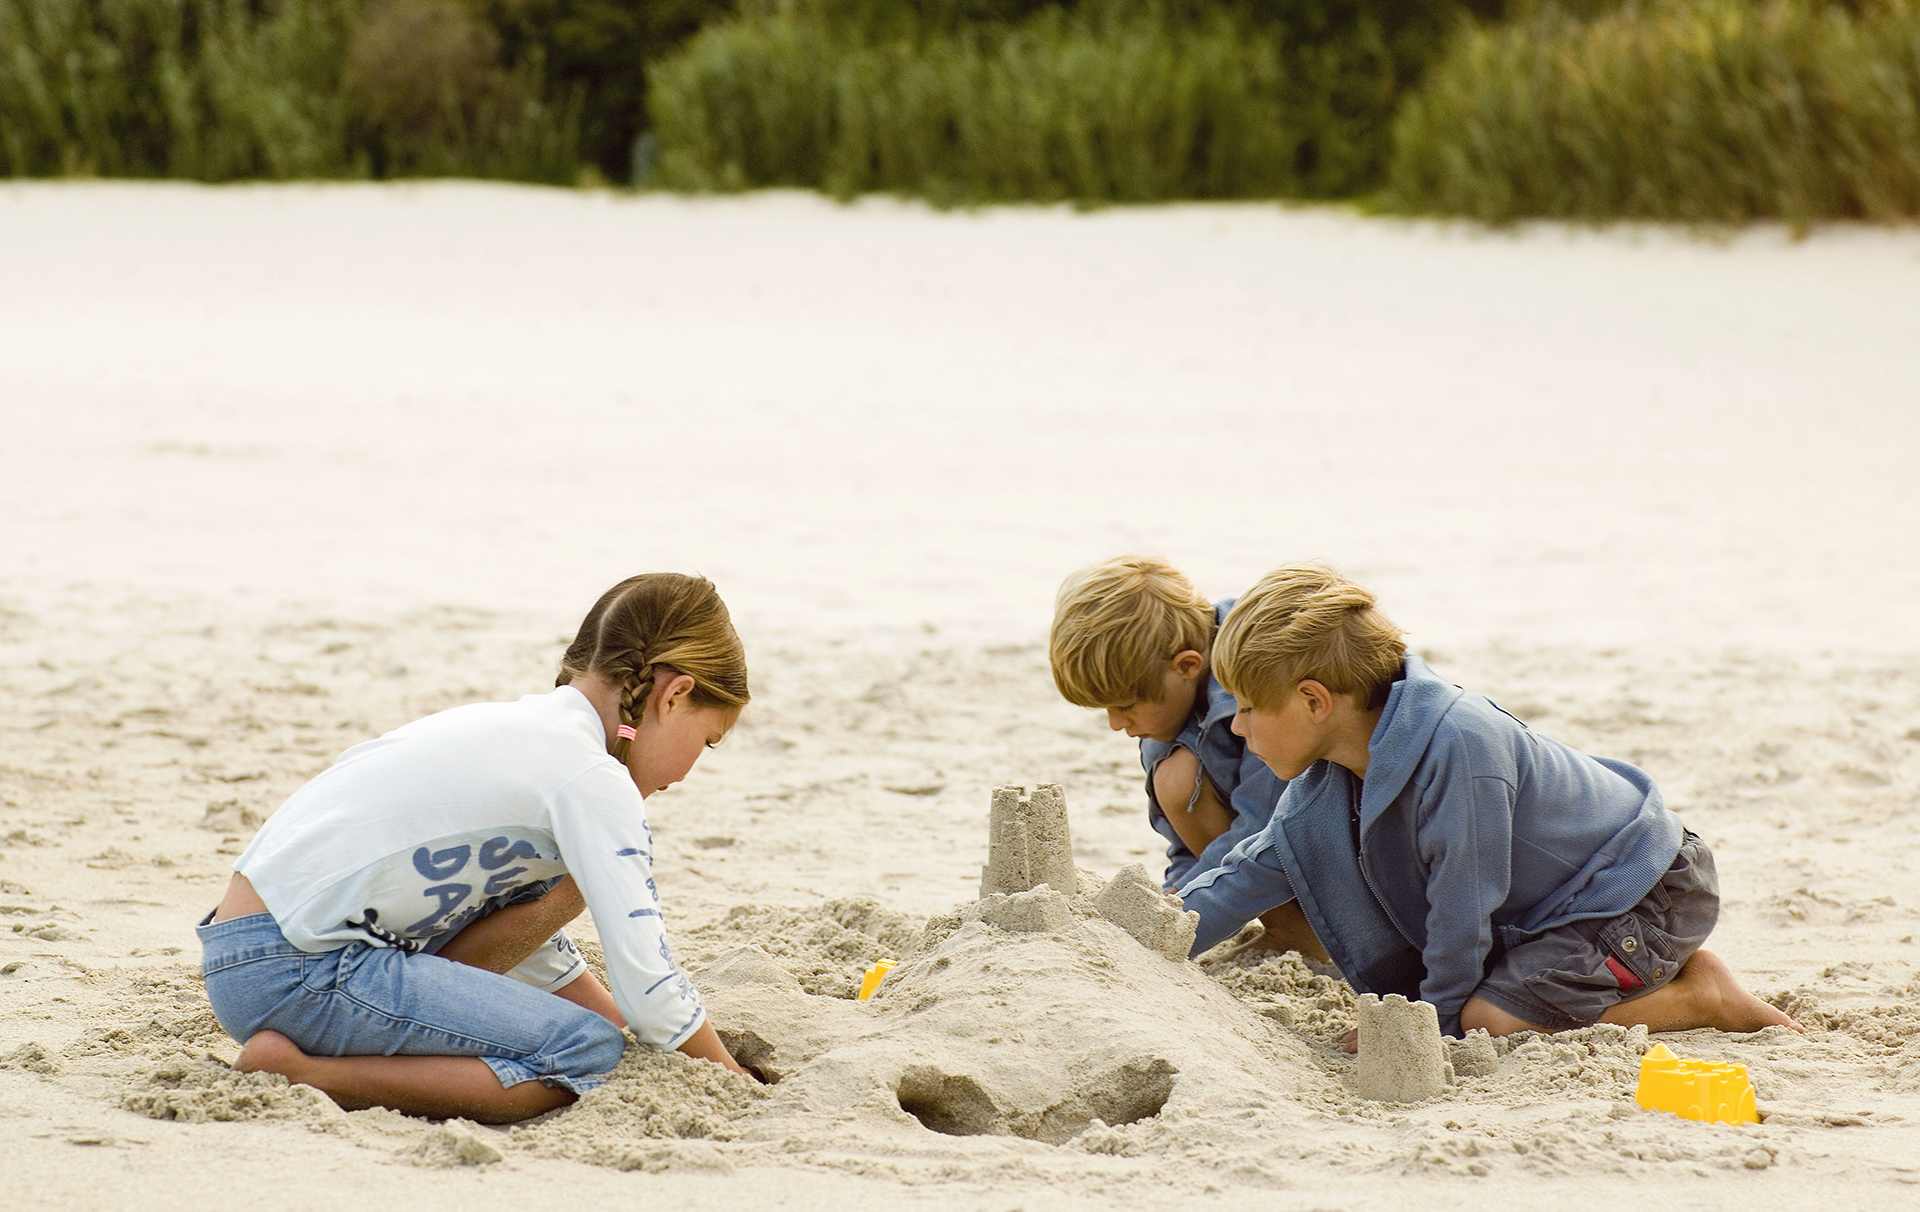 children building sandcastles